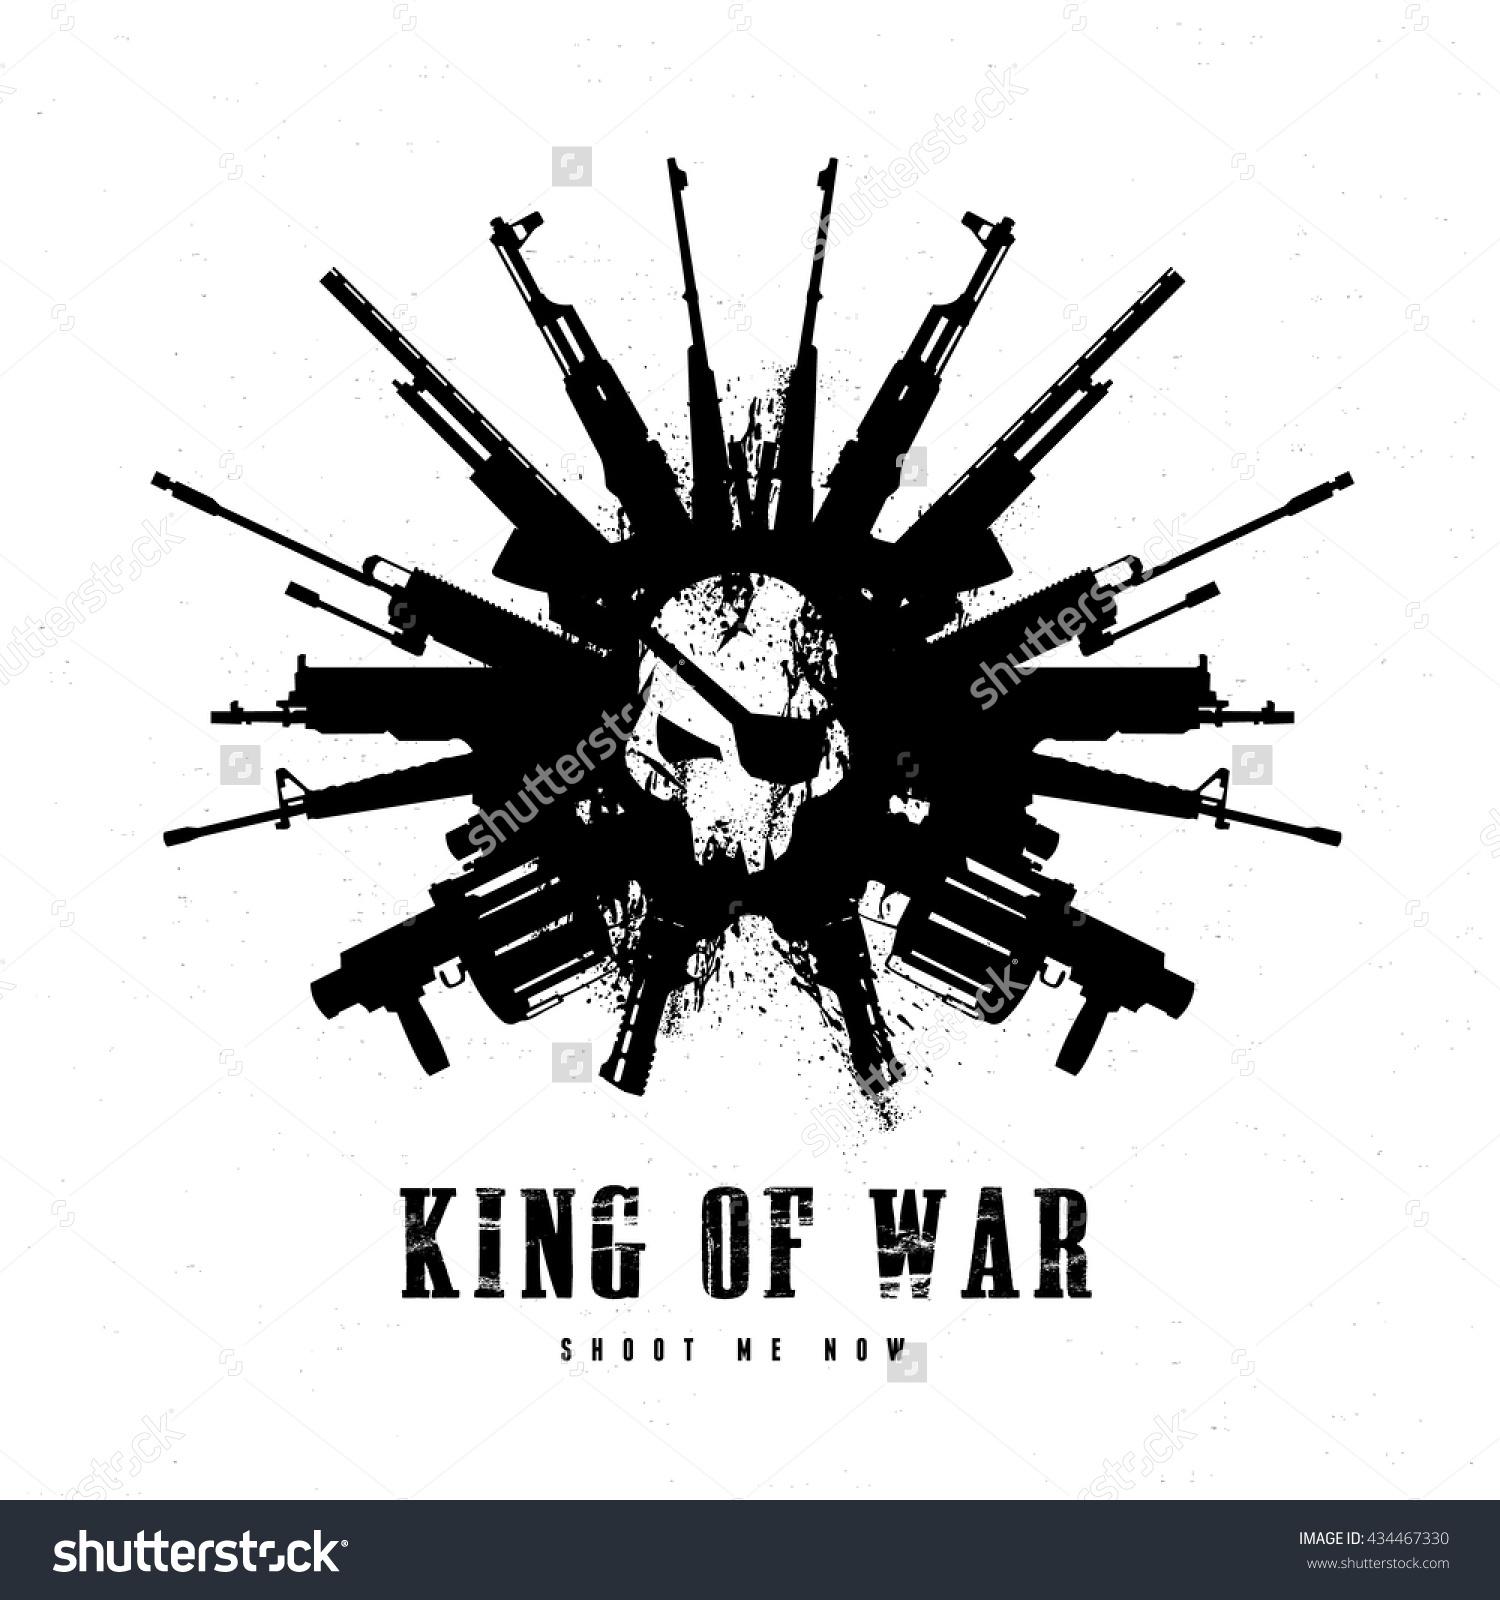 Kings Of War clipart #17, Download drawings